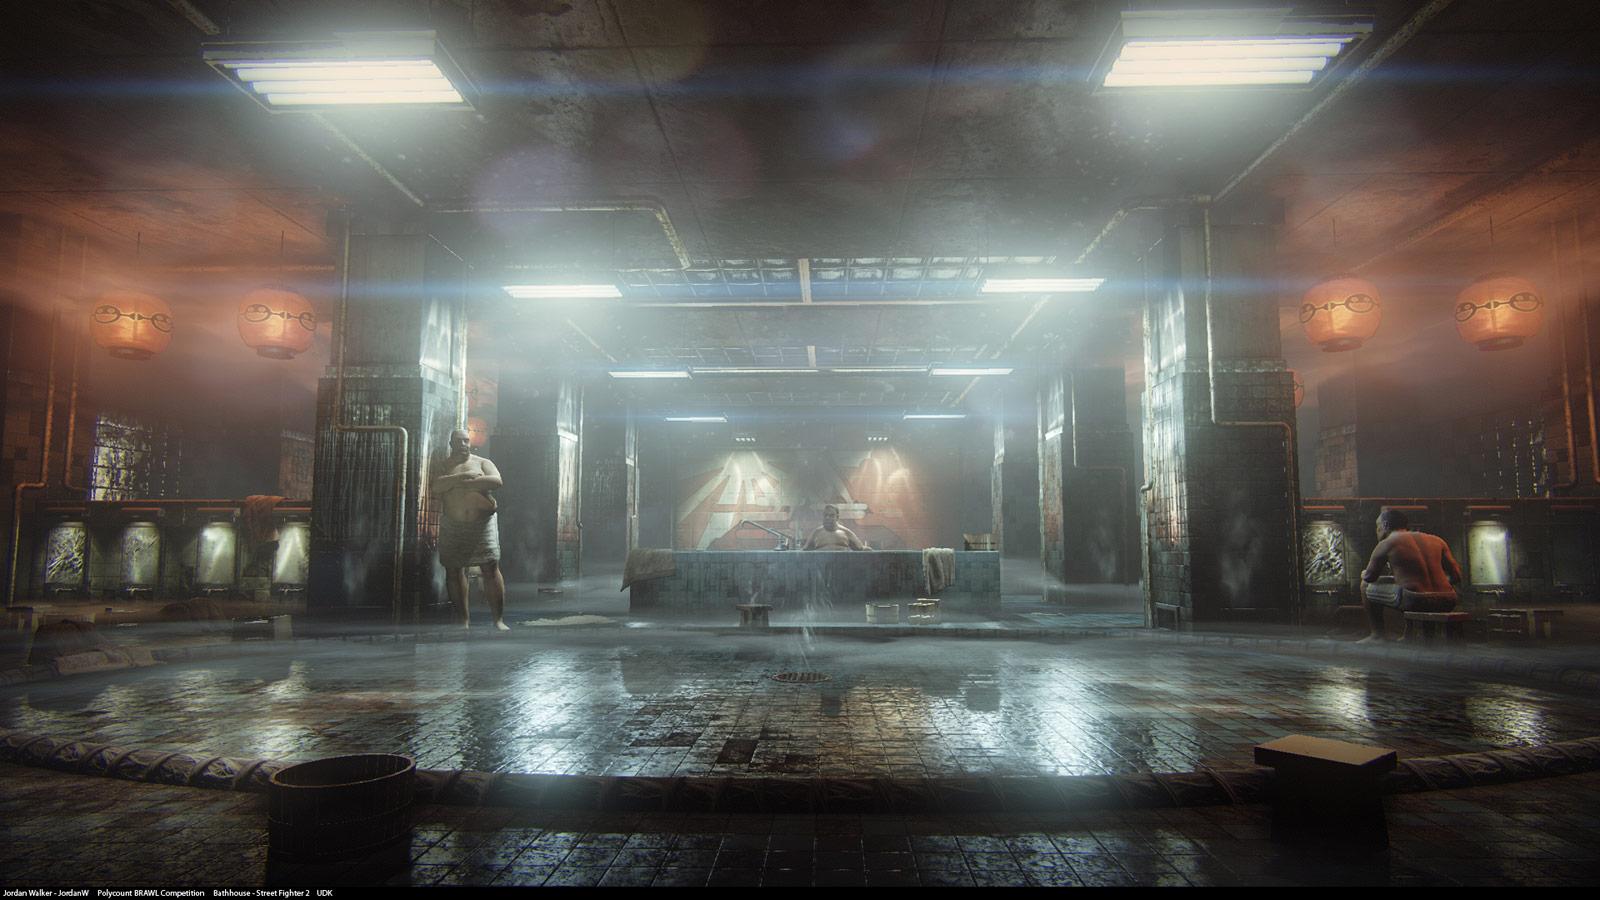 Honda's bath house reimagined image #1